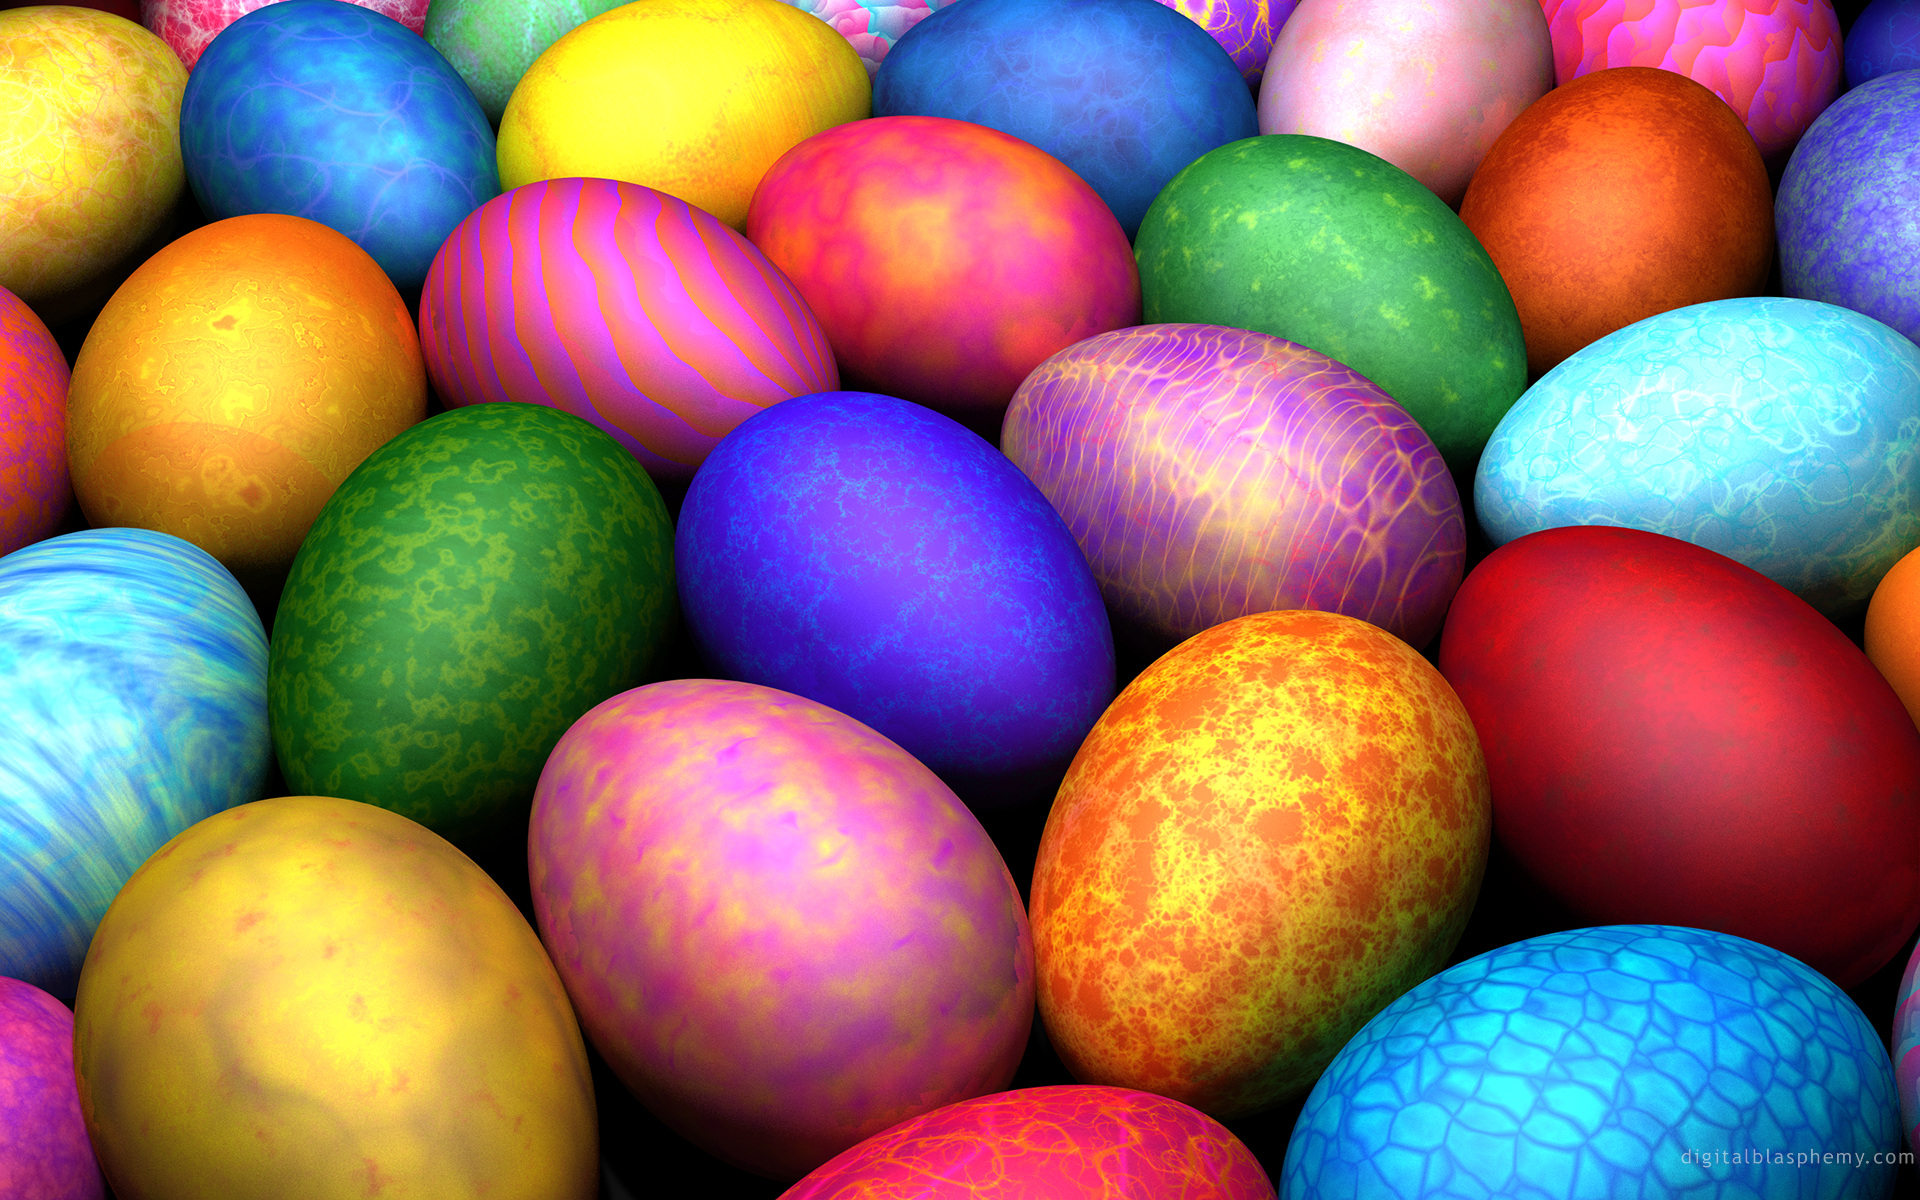 Free Download Easter Wallpaper Windows 7 Bilders 1920x1200 For